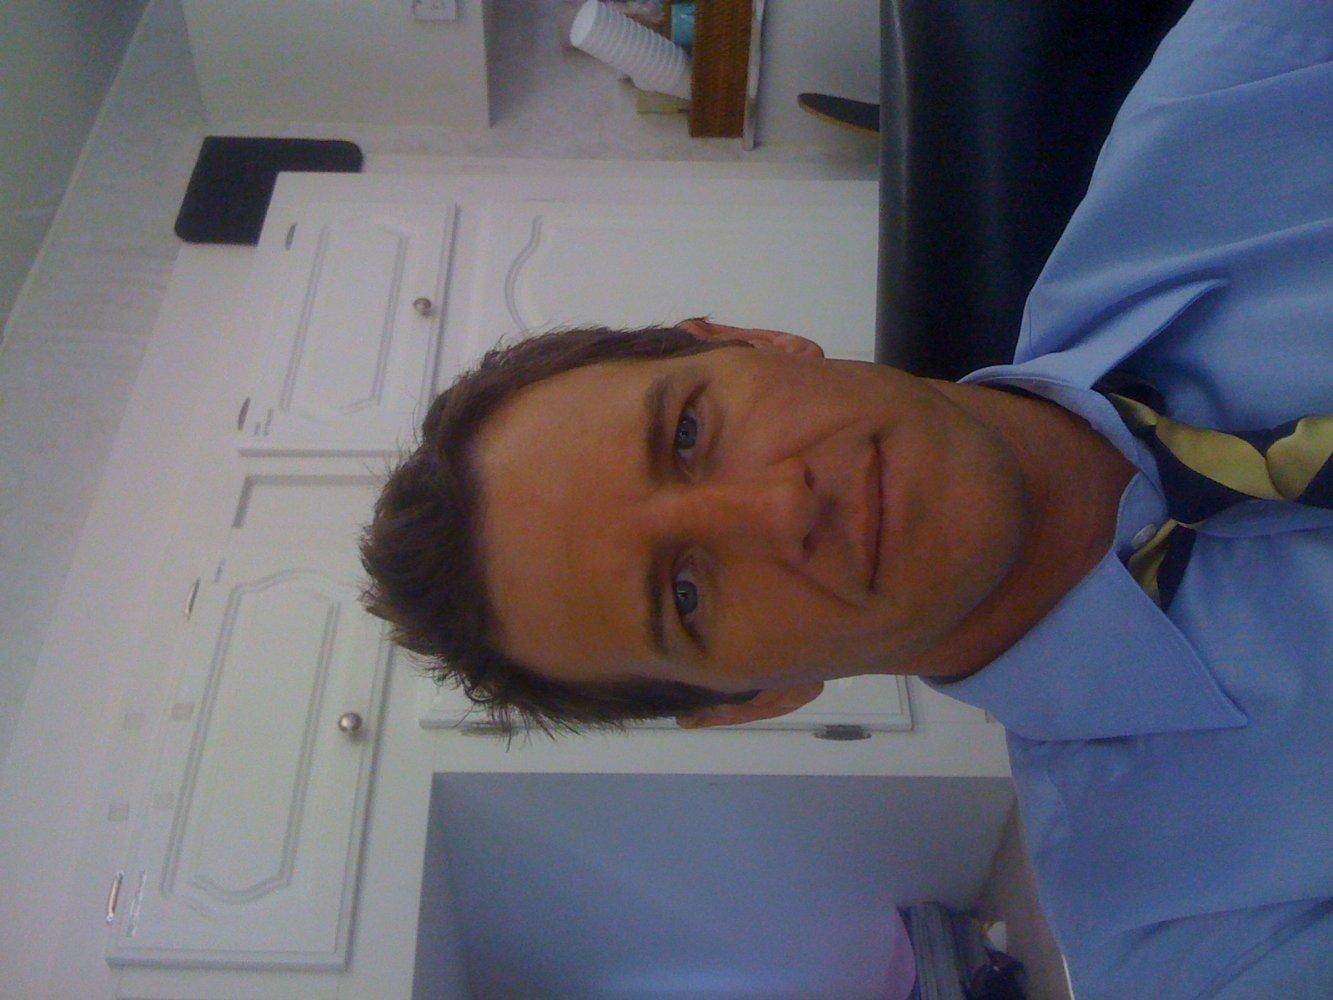 Matt Baker